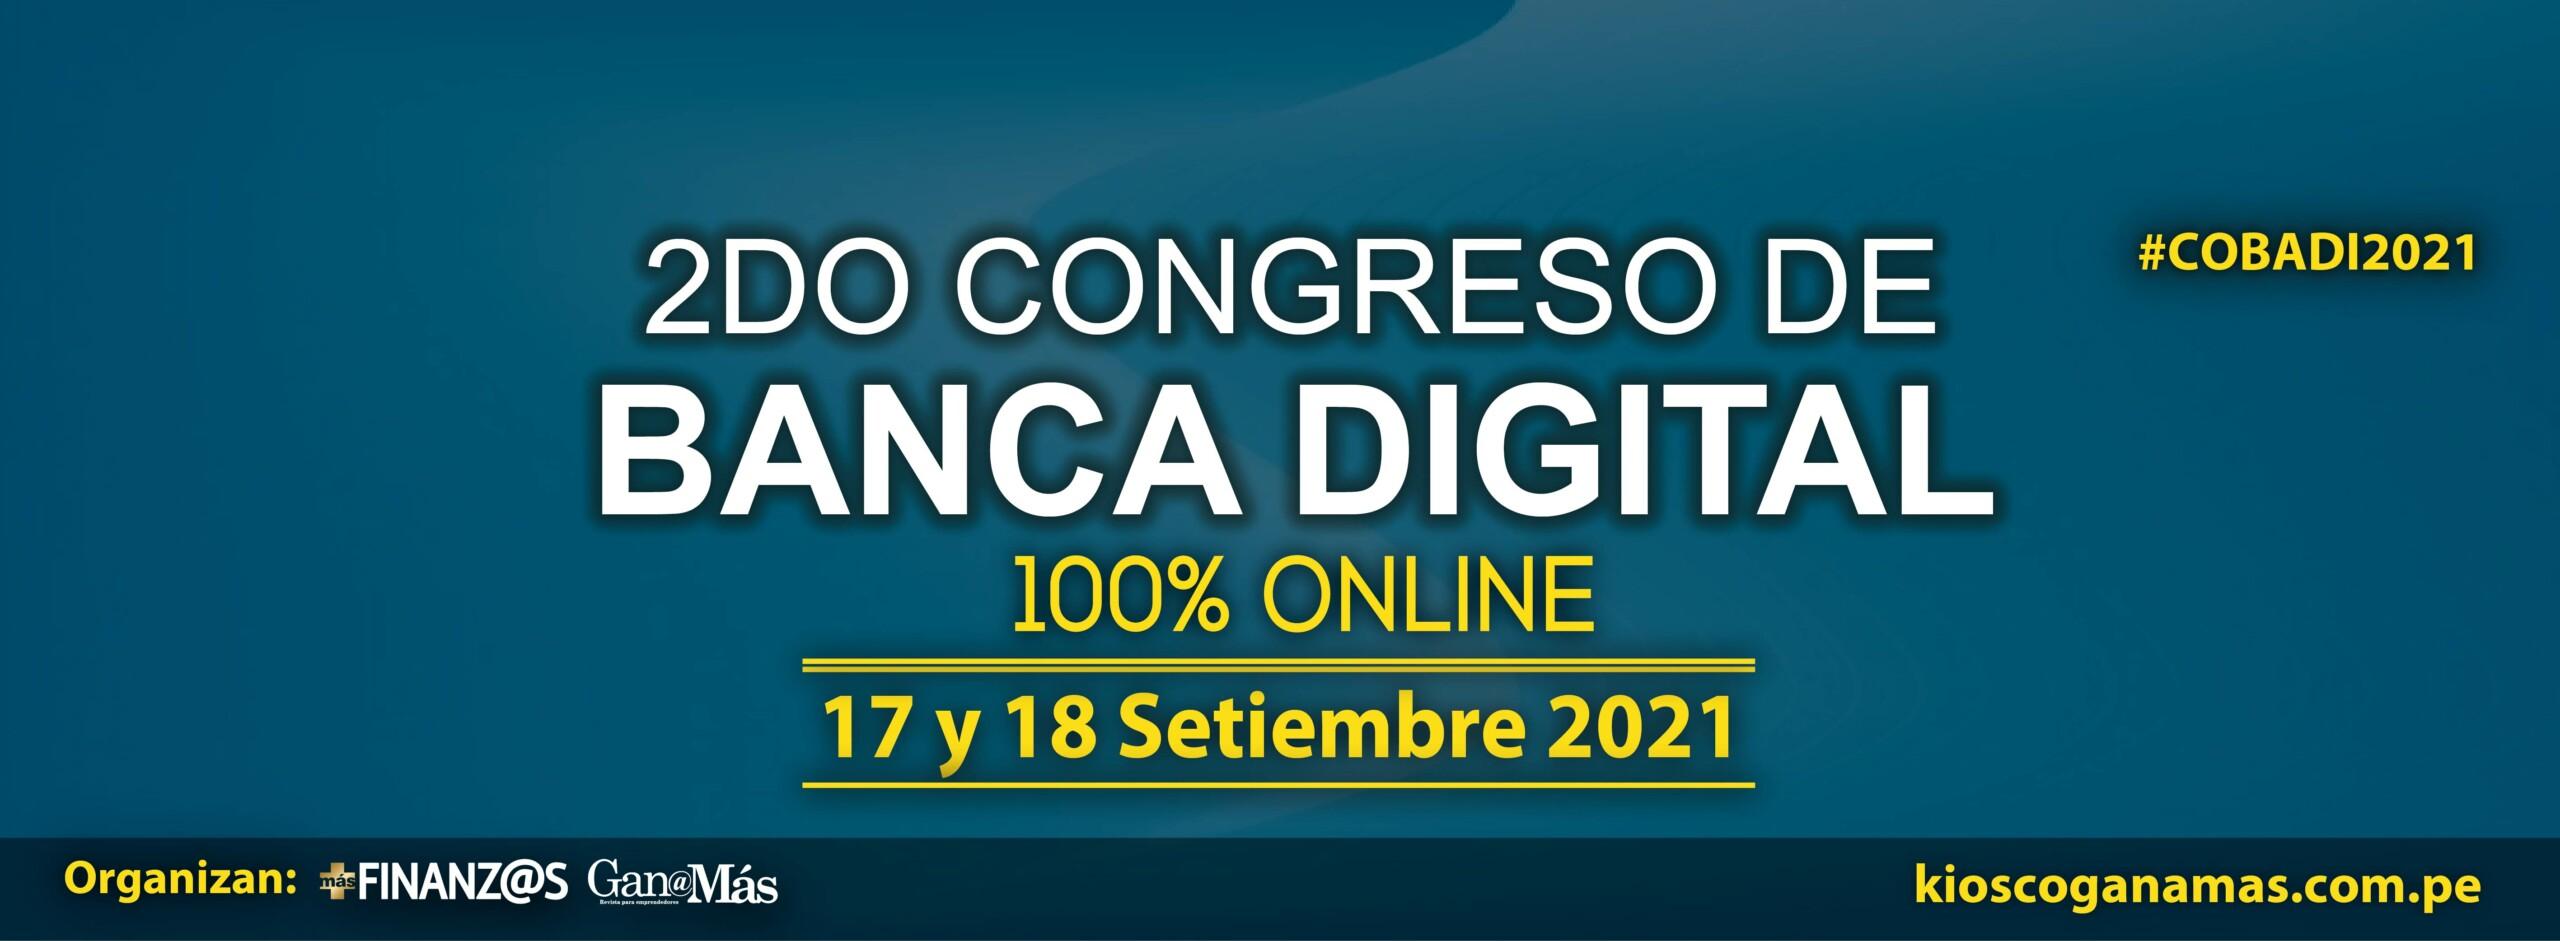 2do Congreso Online de Banca Digital